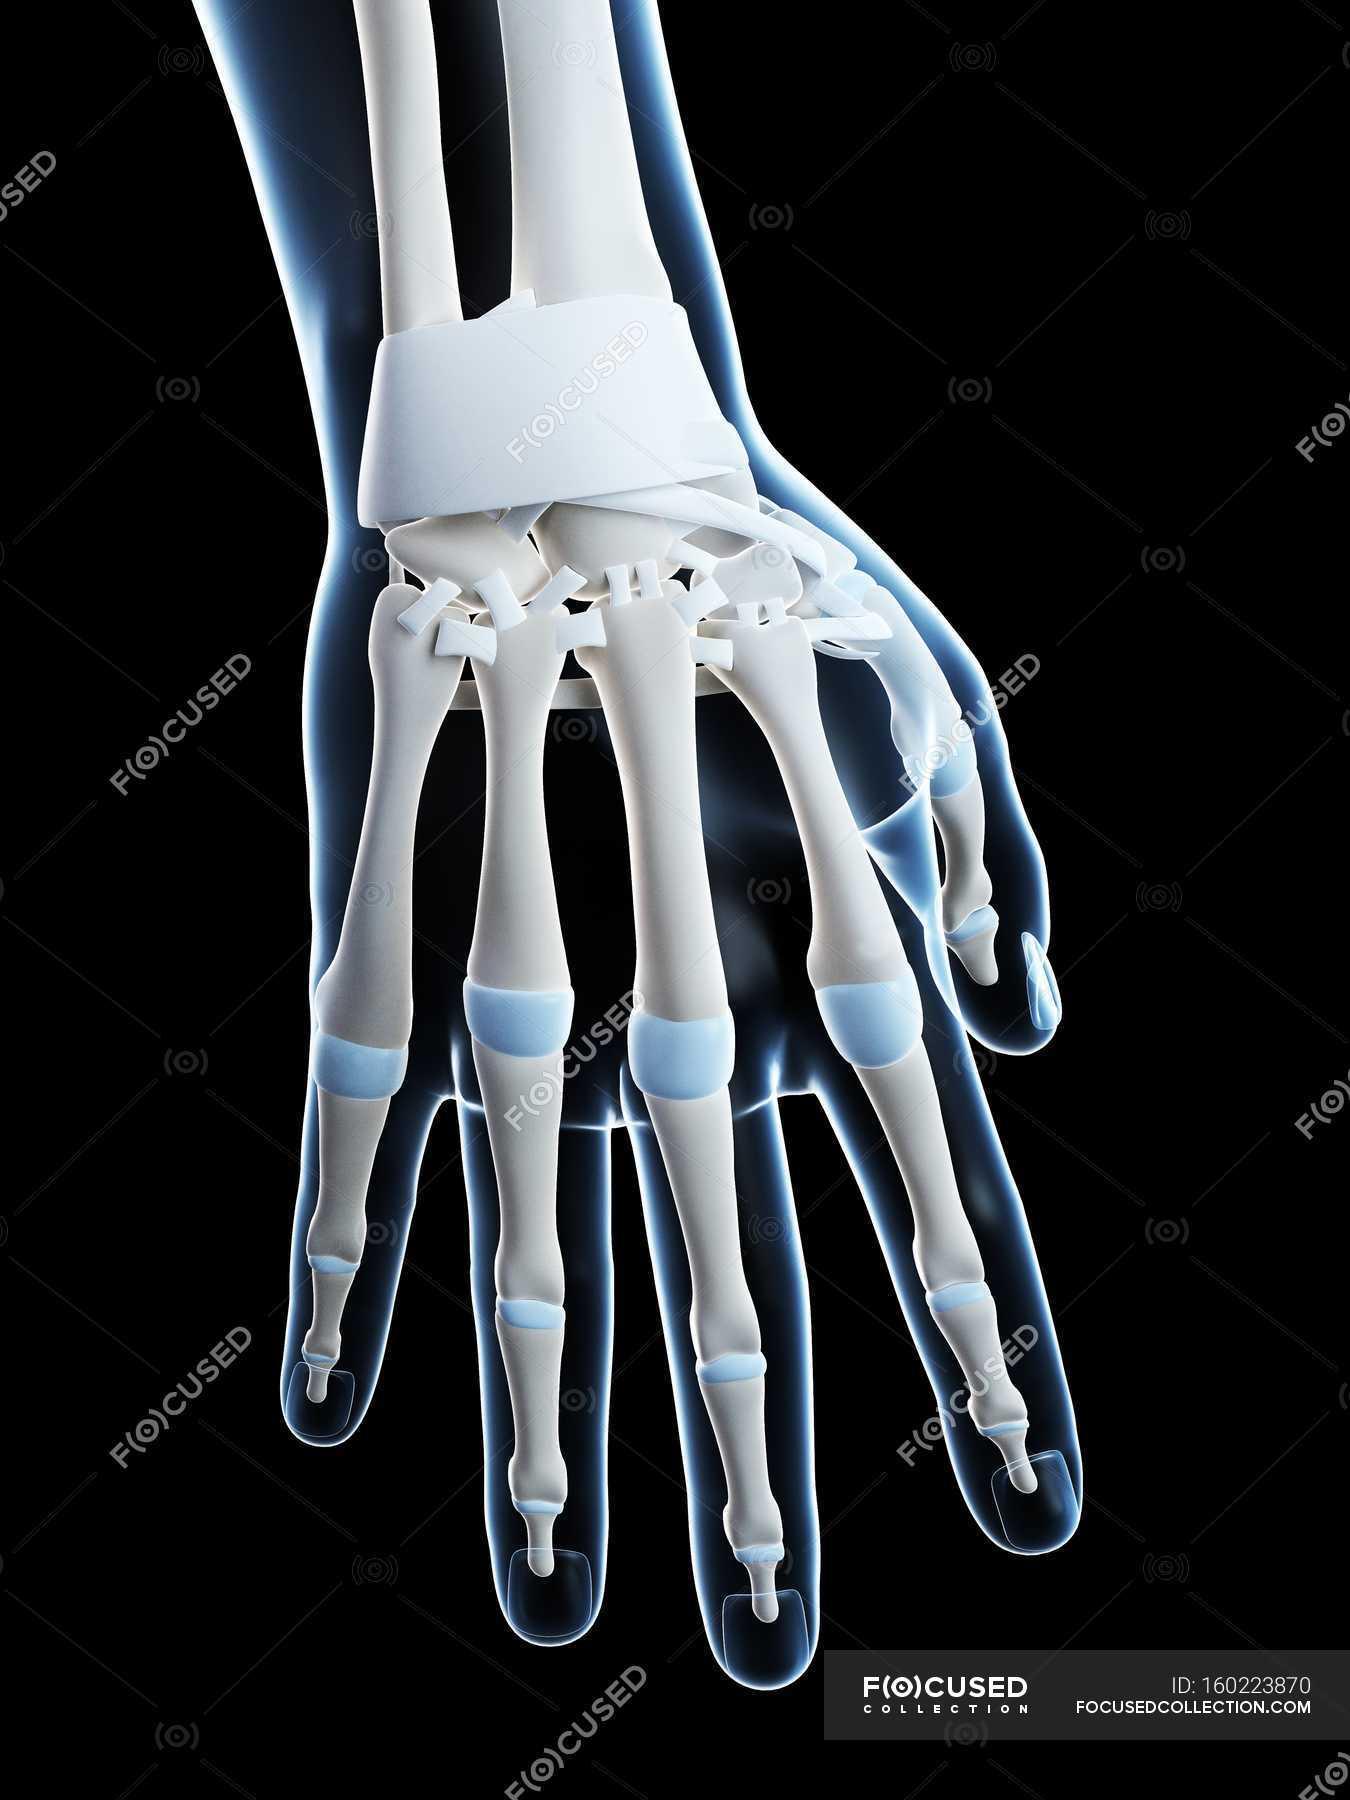 Human Hand Bones Anatomy Black Background No One Stock Photo